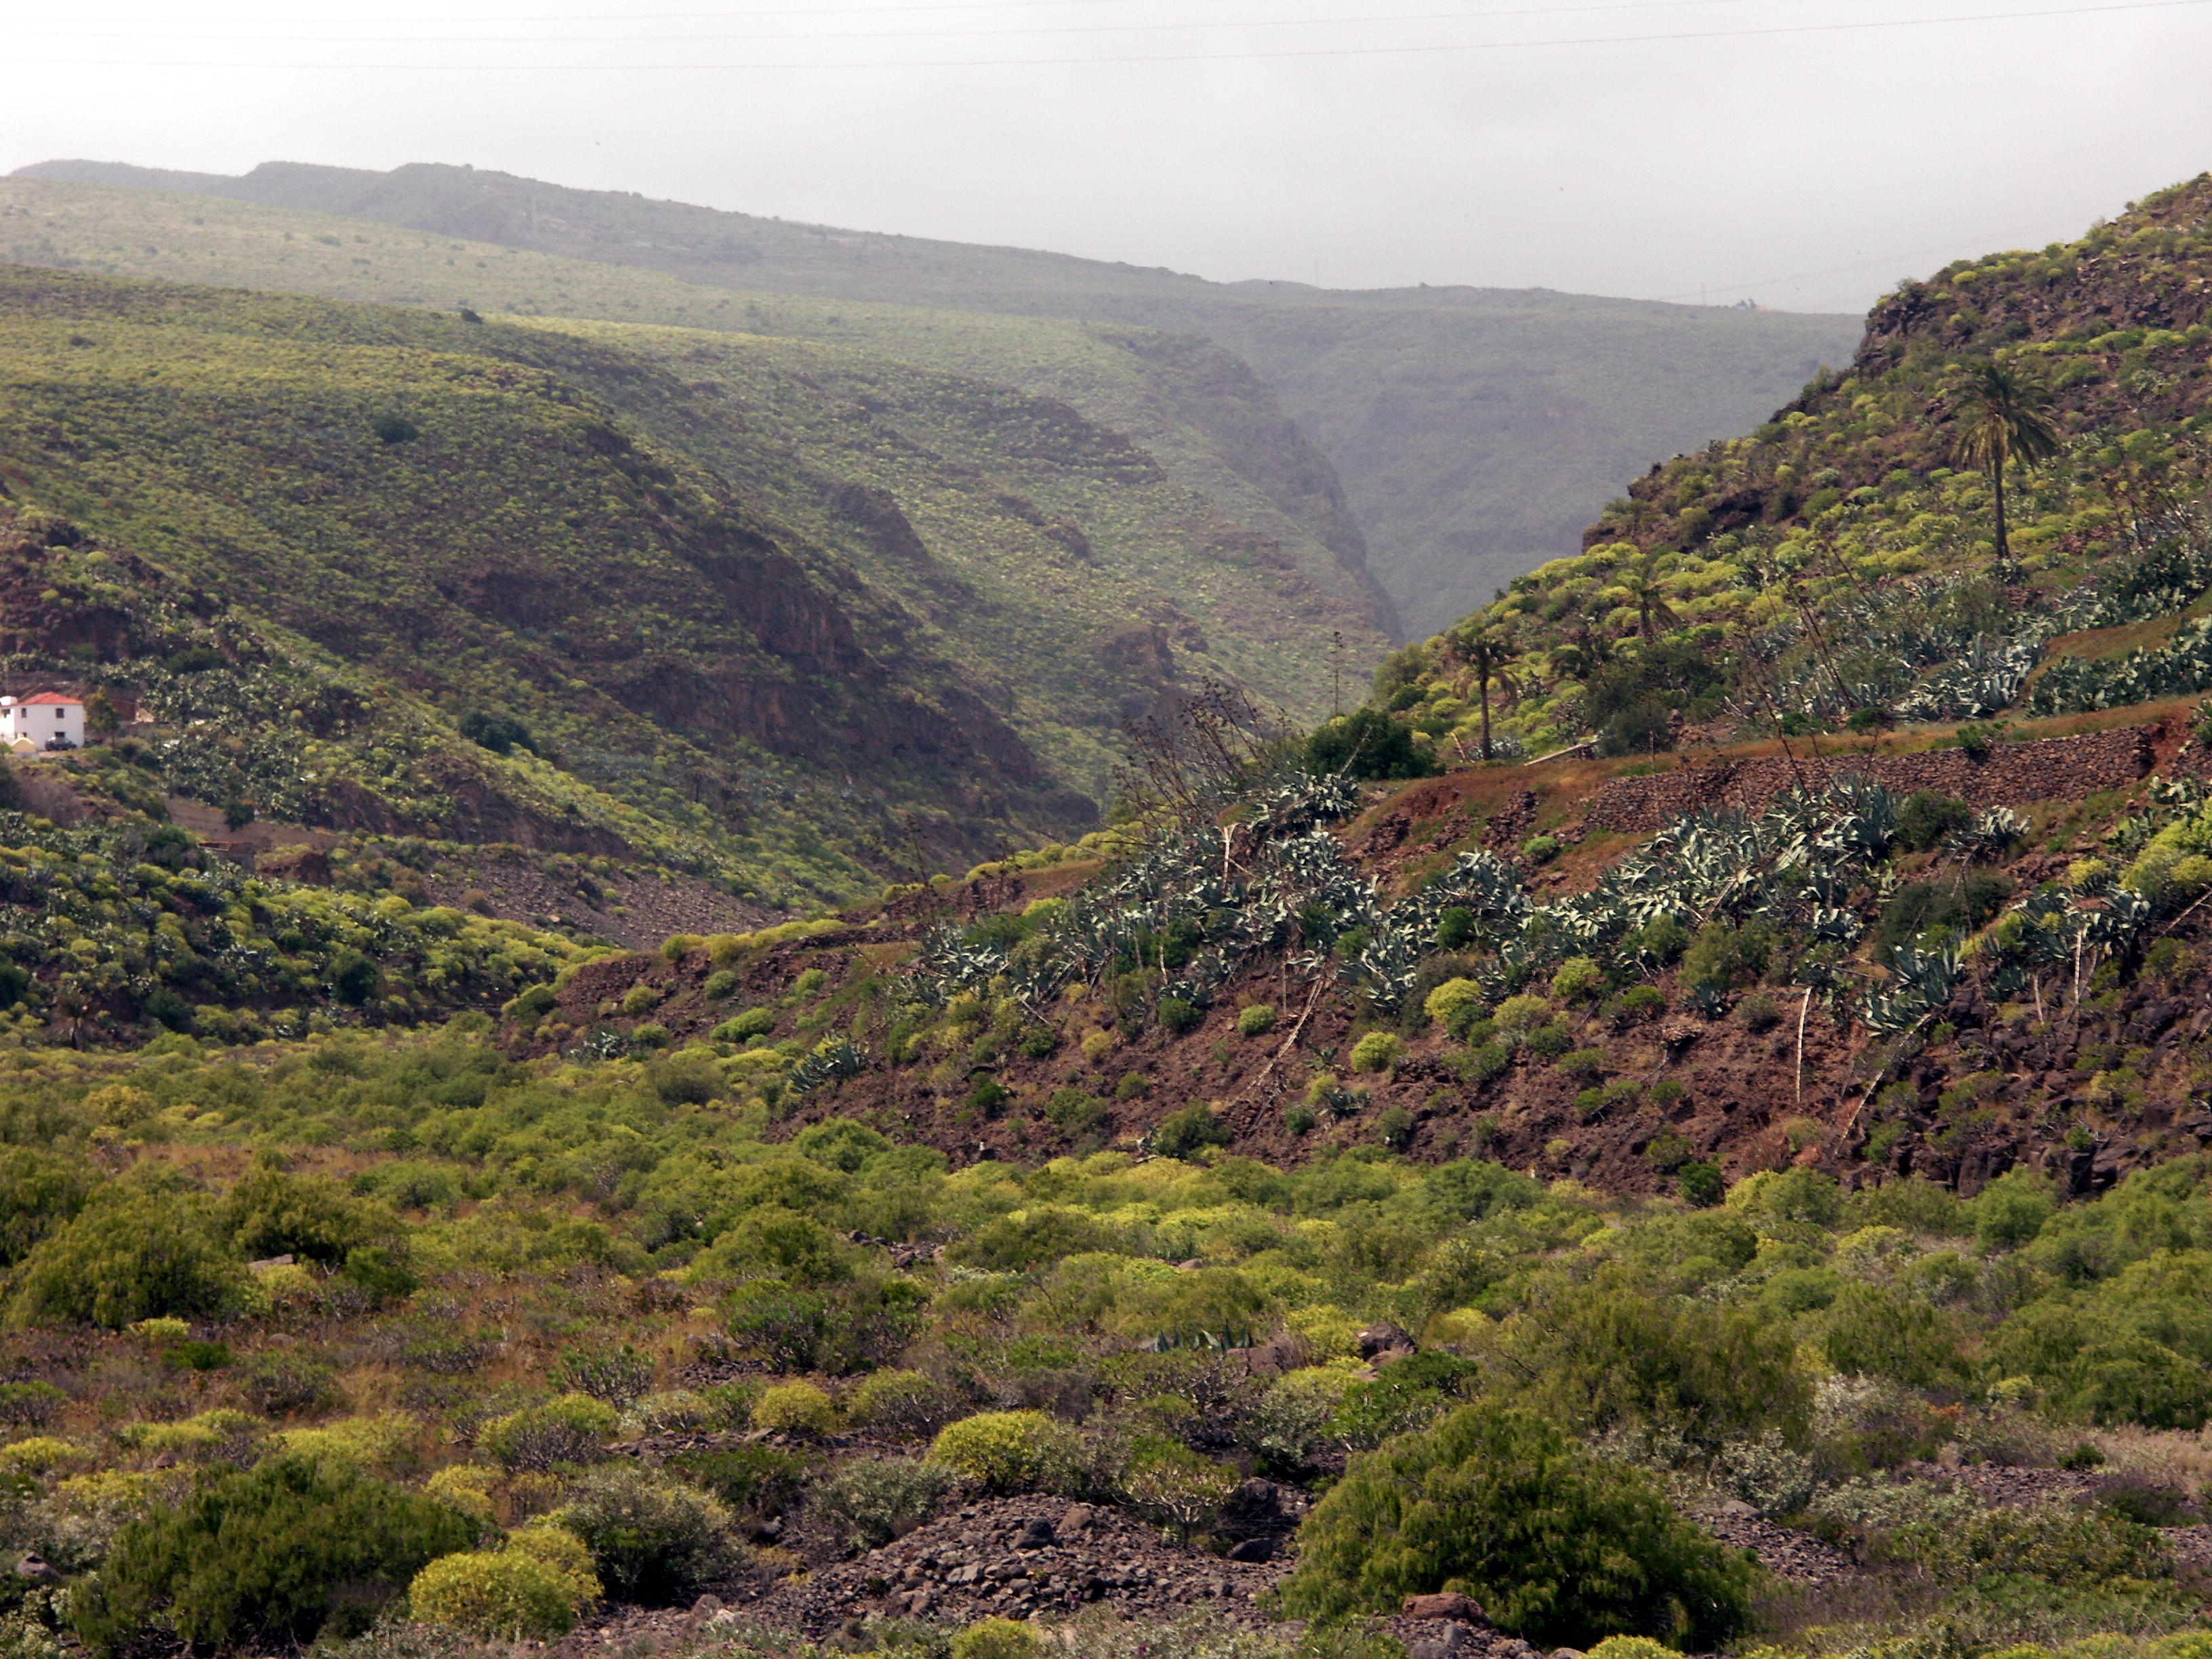 File:Barranco de Guayadeque Gran Canaria Spanien freigestellt.jpg